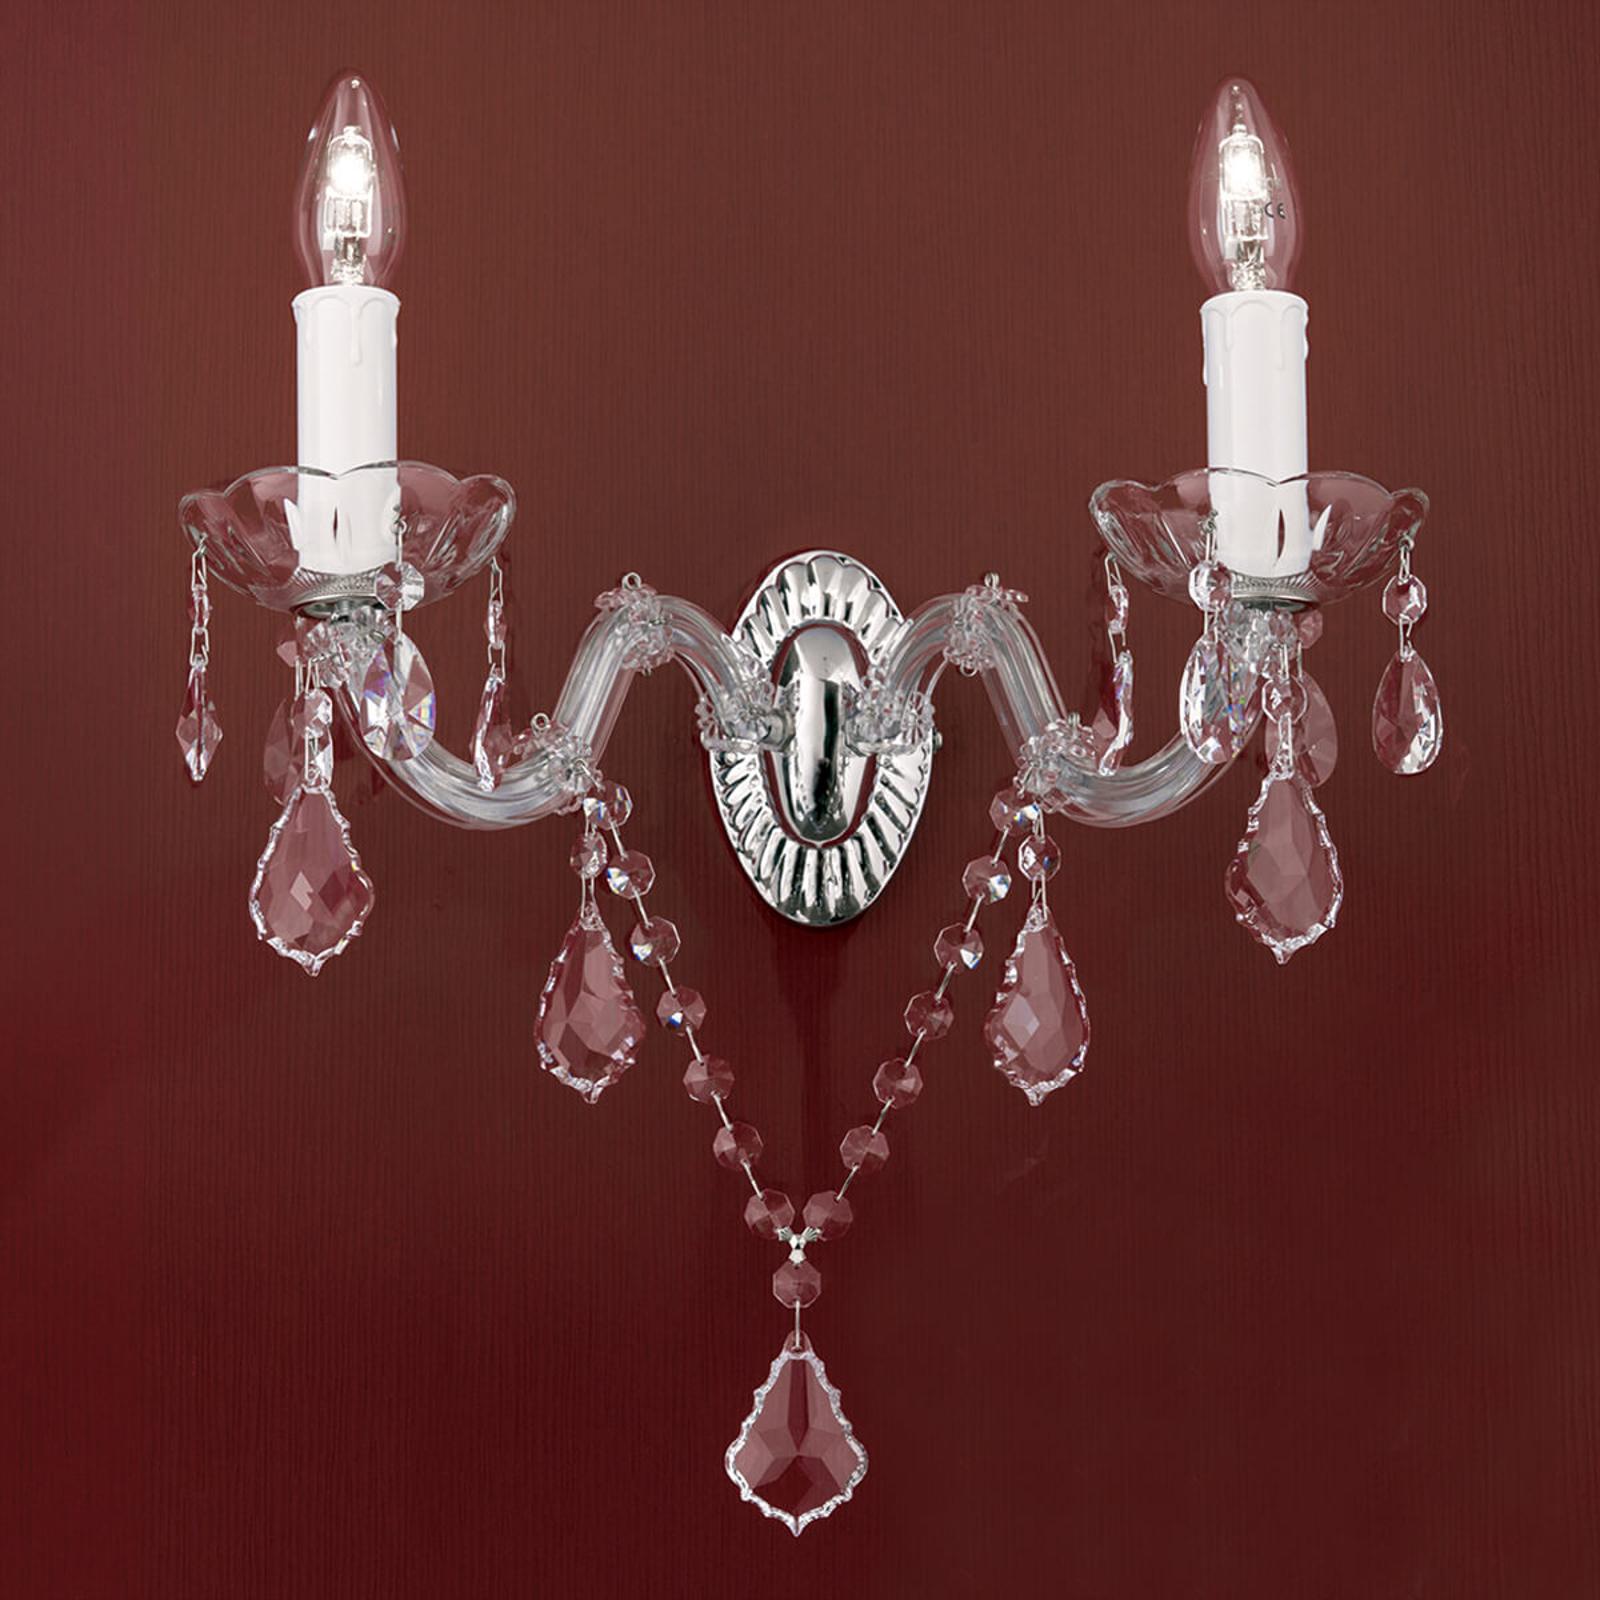 Kryształowa lampa ścienna Maria Teresa